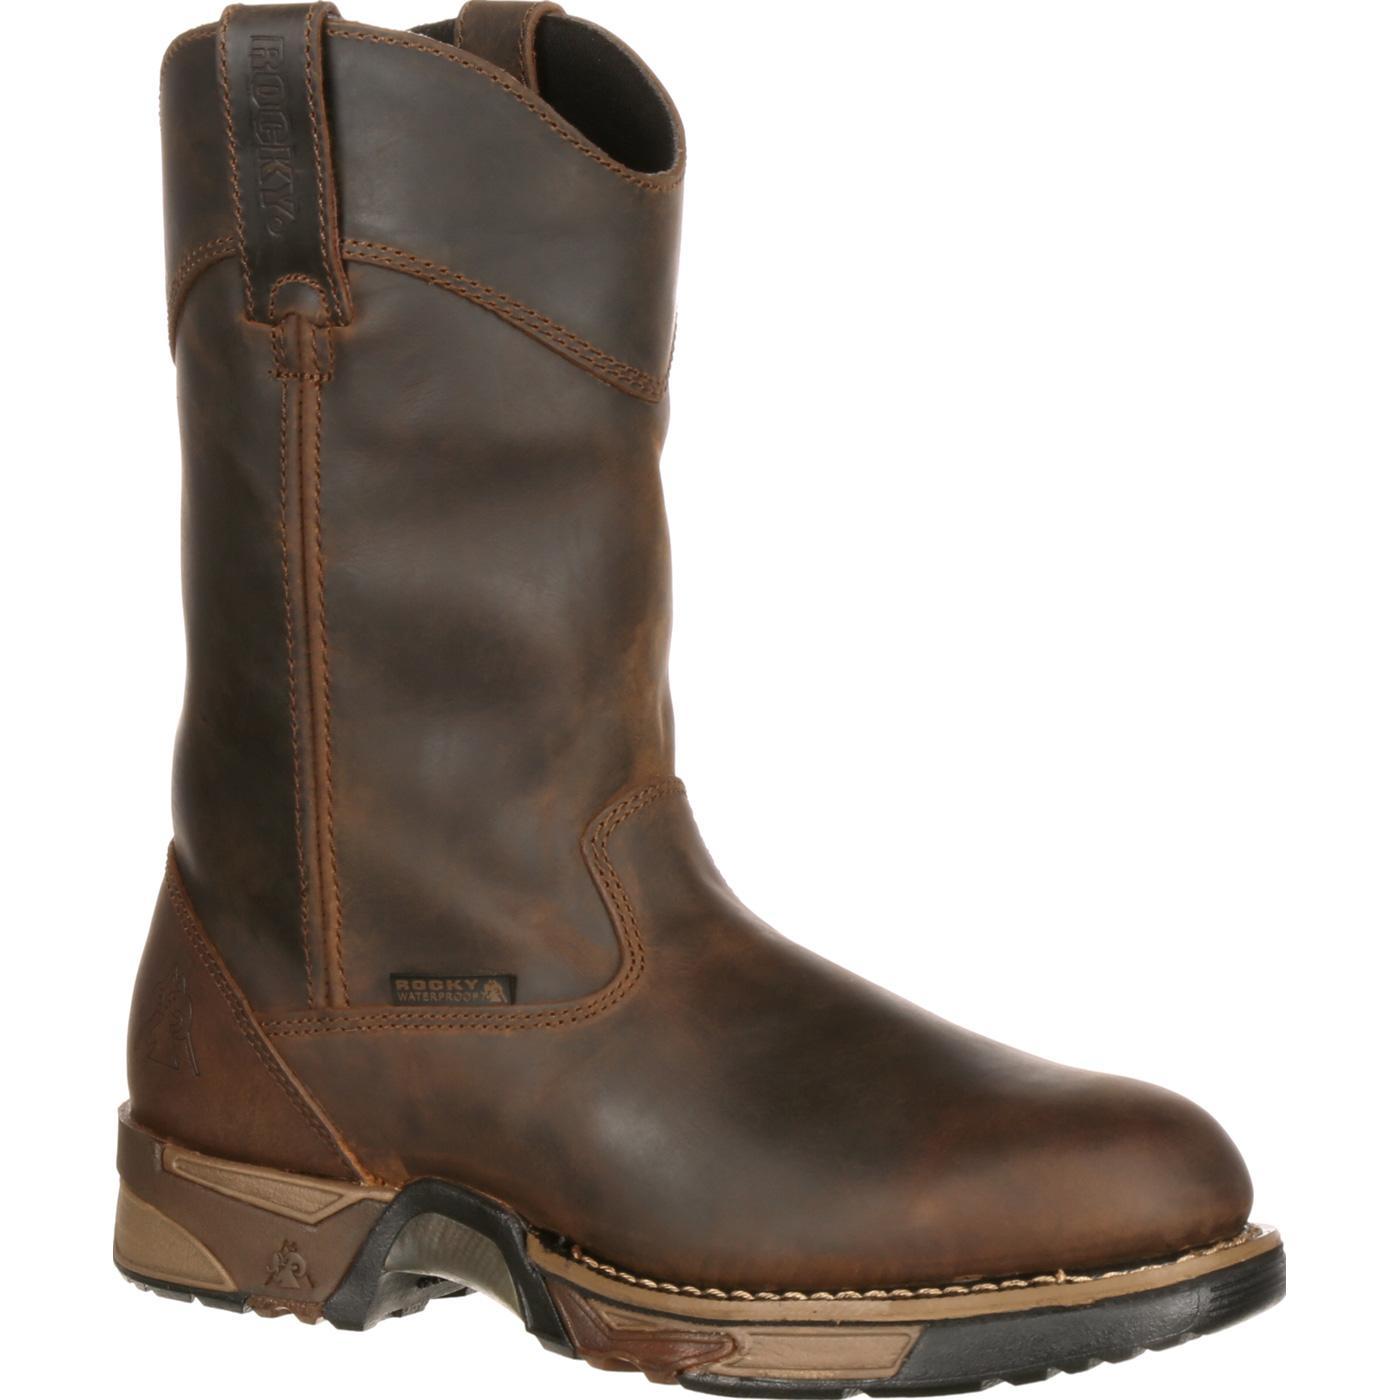 d351ecb3f65 Rocky Aztec Waterproof Wellington Work Boot